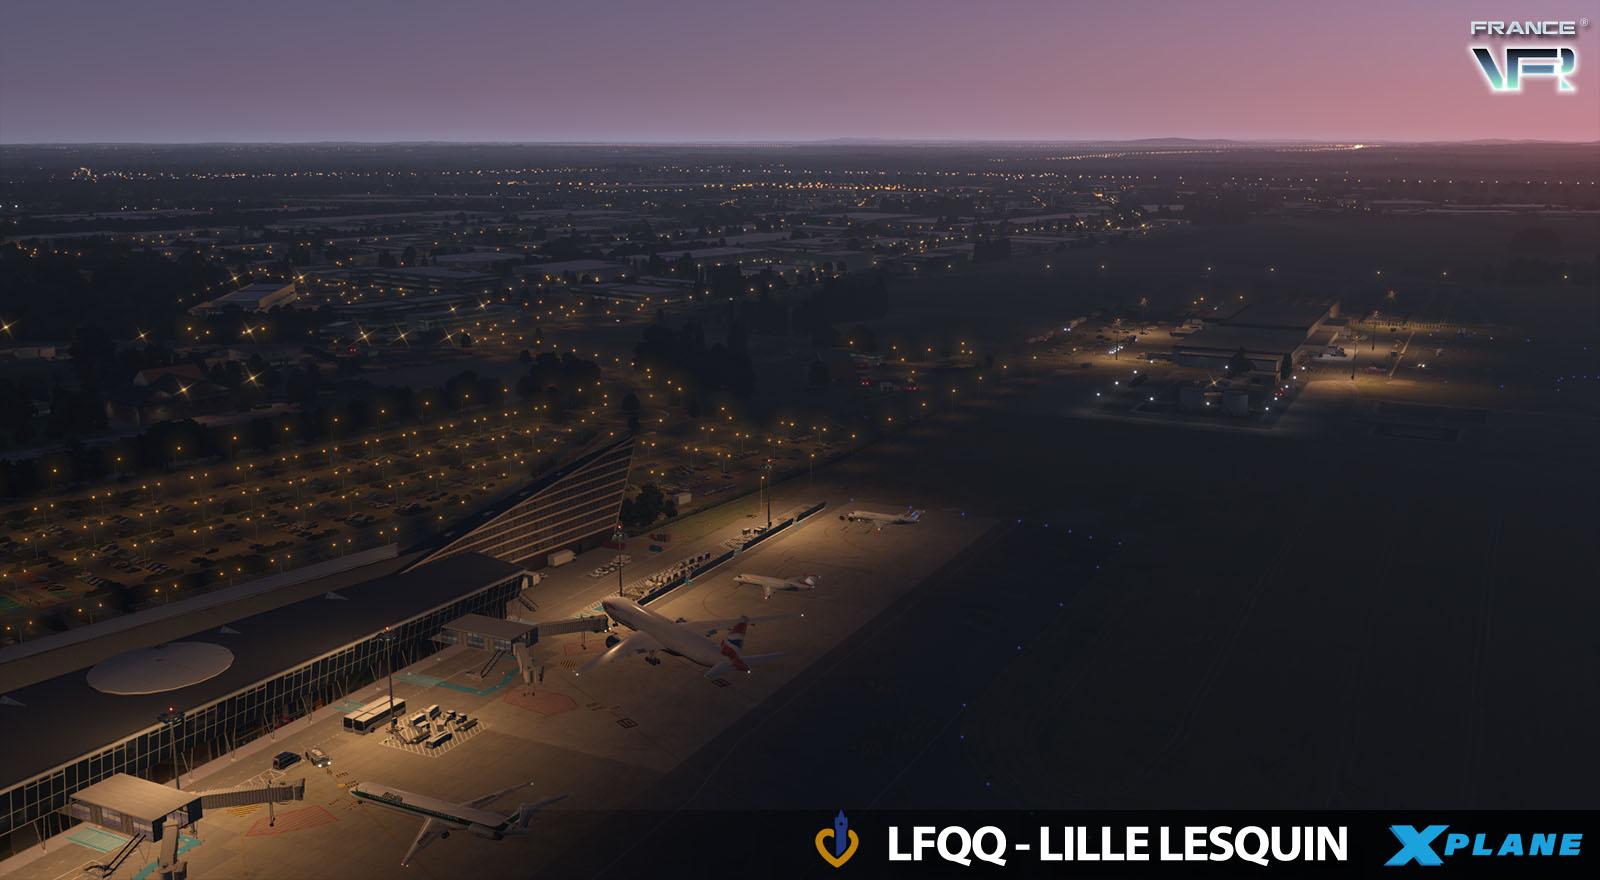 LFQQXP_38